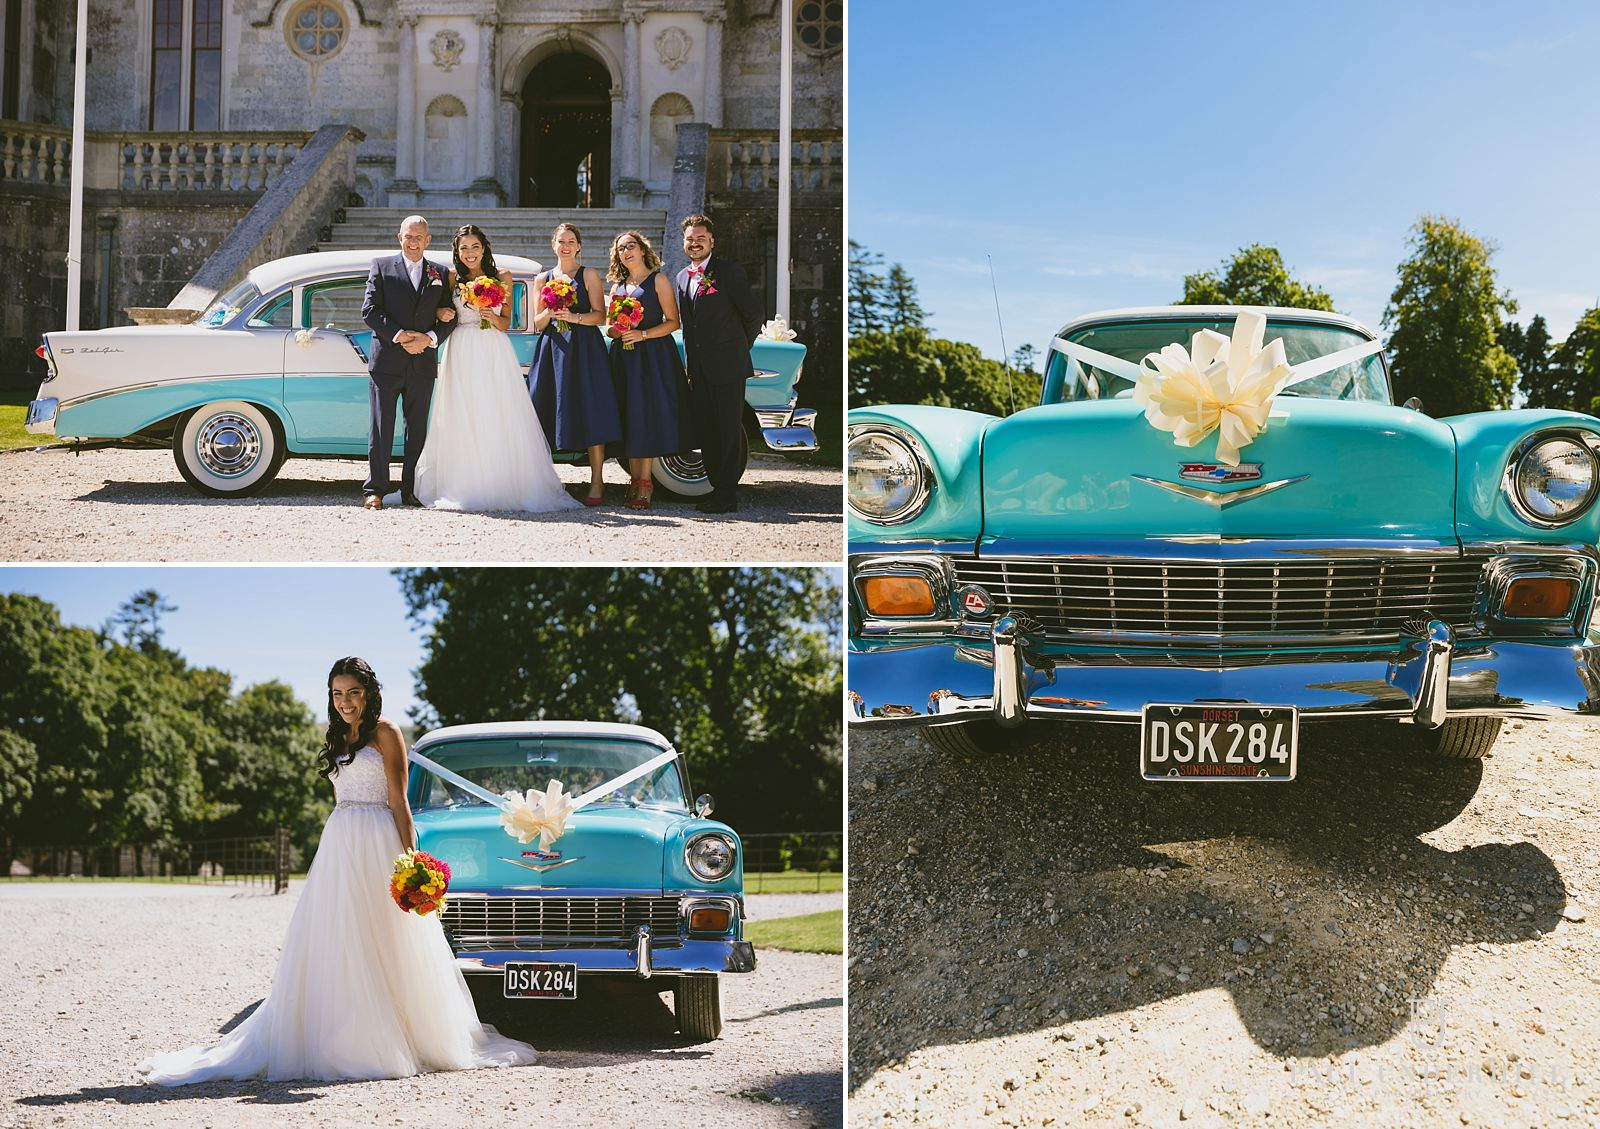 vintage-american-wedding-car-at-lulworth-castle